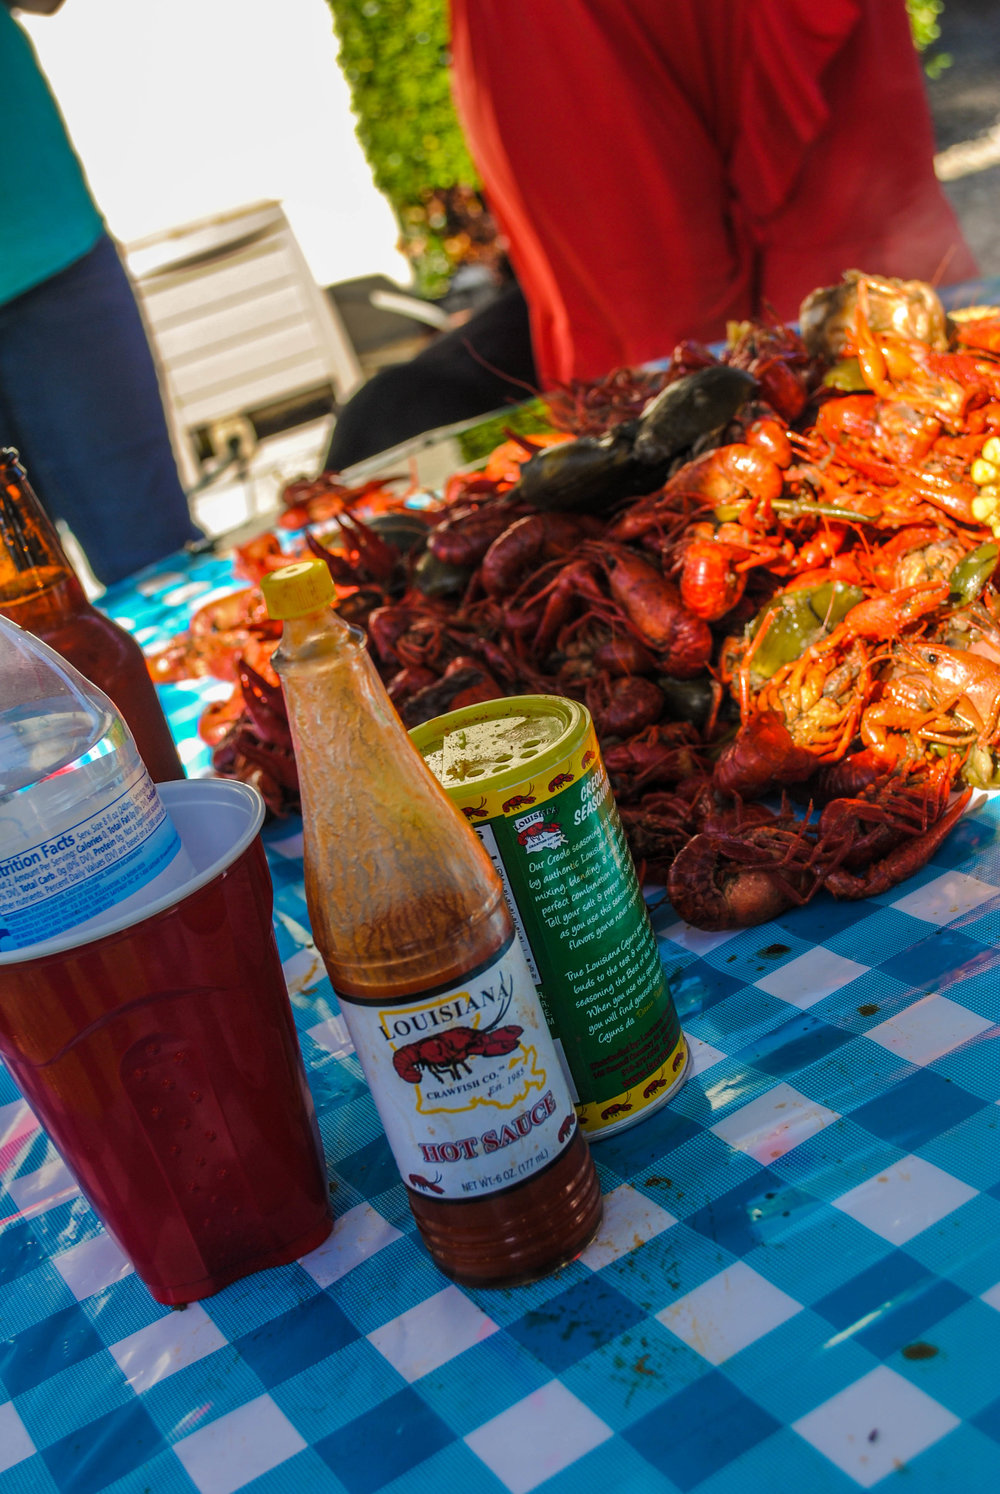 crawfish and louisiana hot sauce